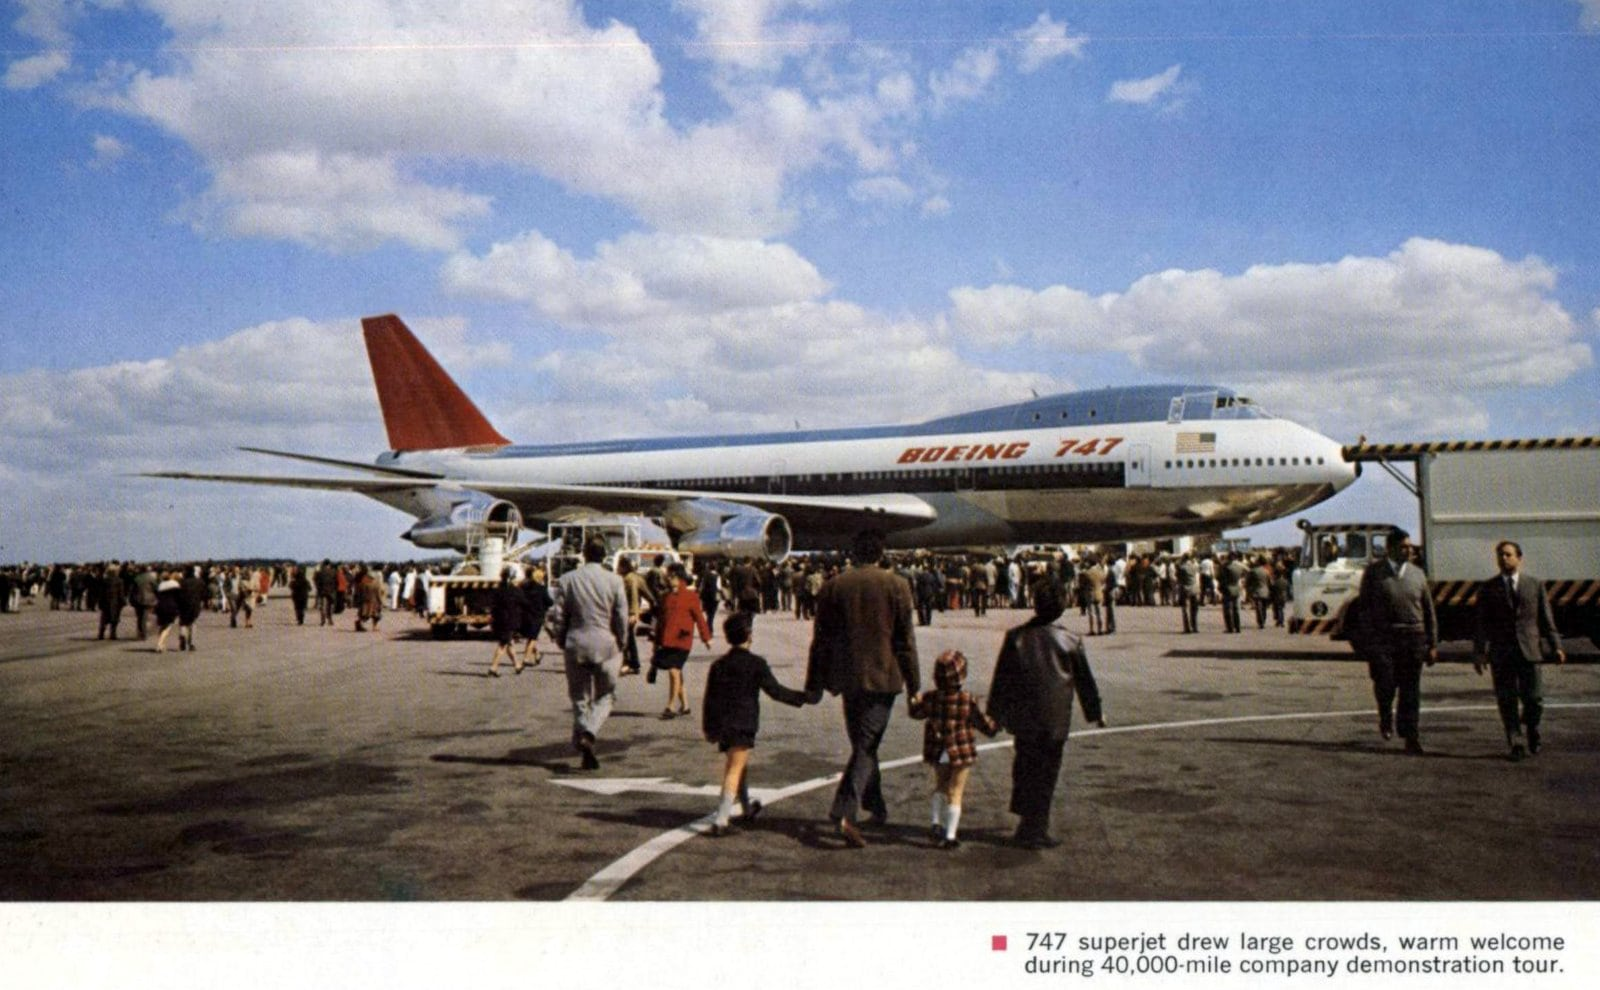 747 plane on 40000 mile company demonstration (1970)